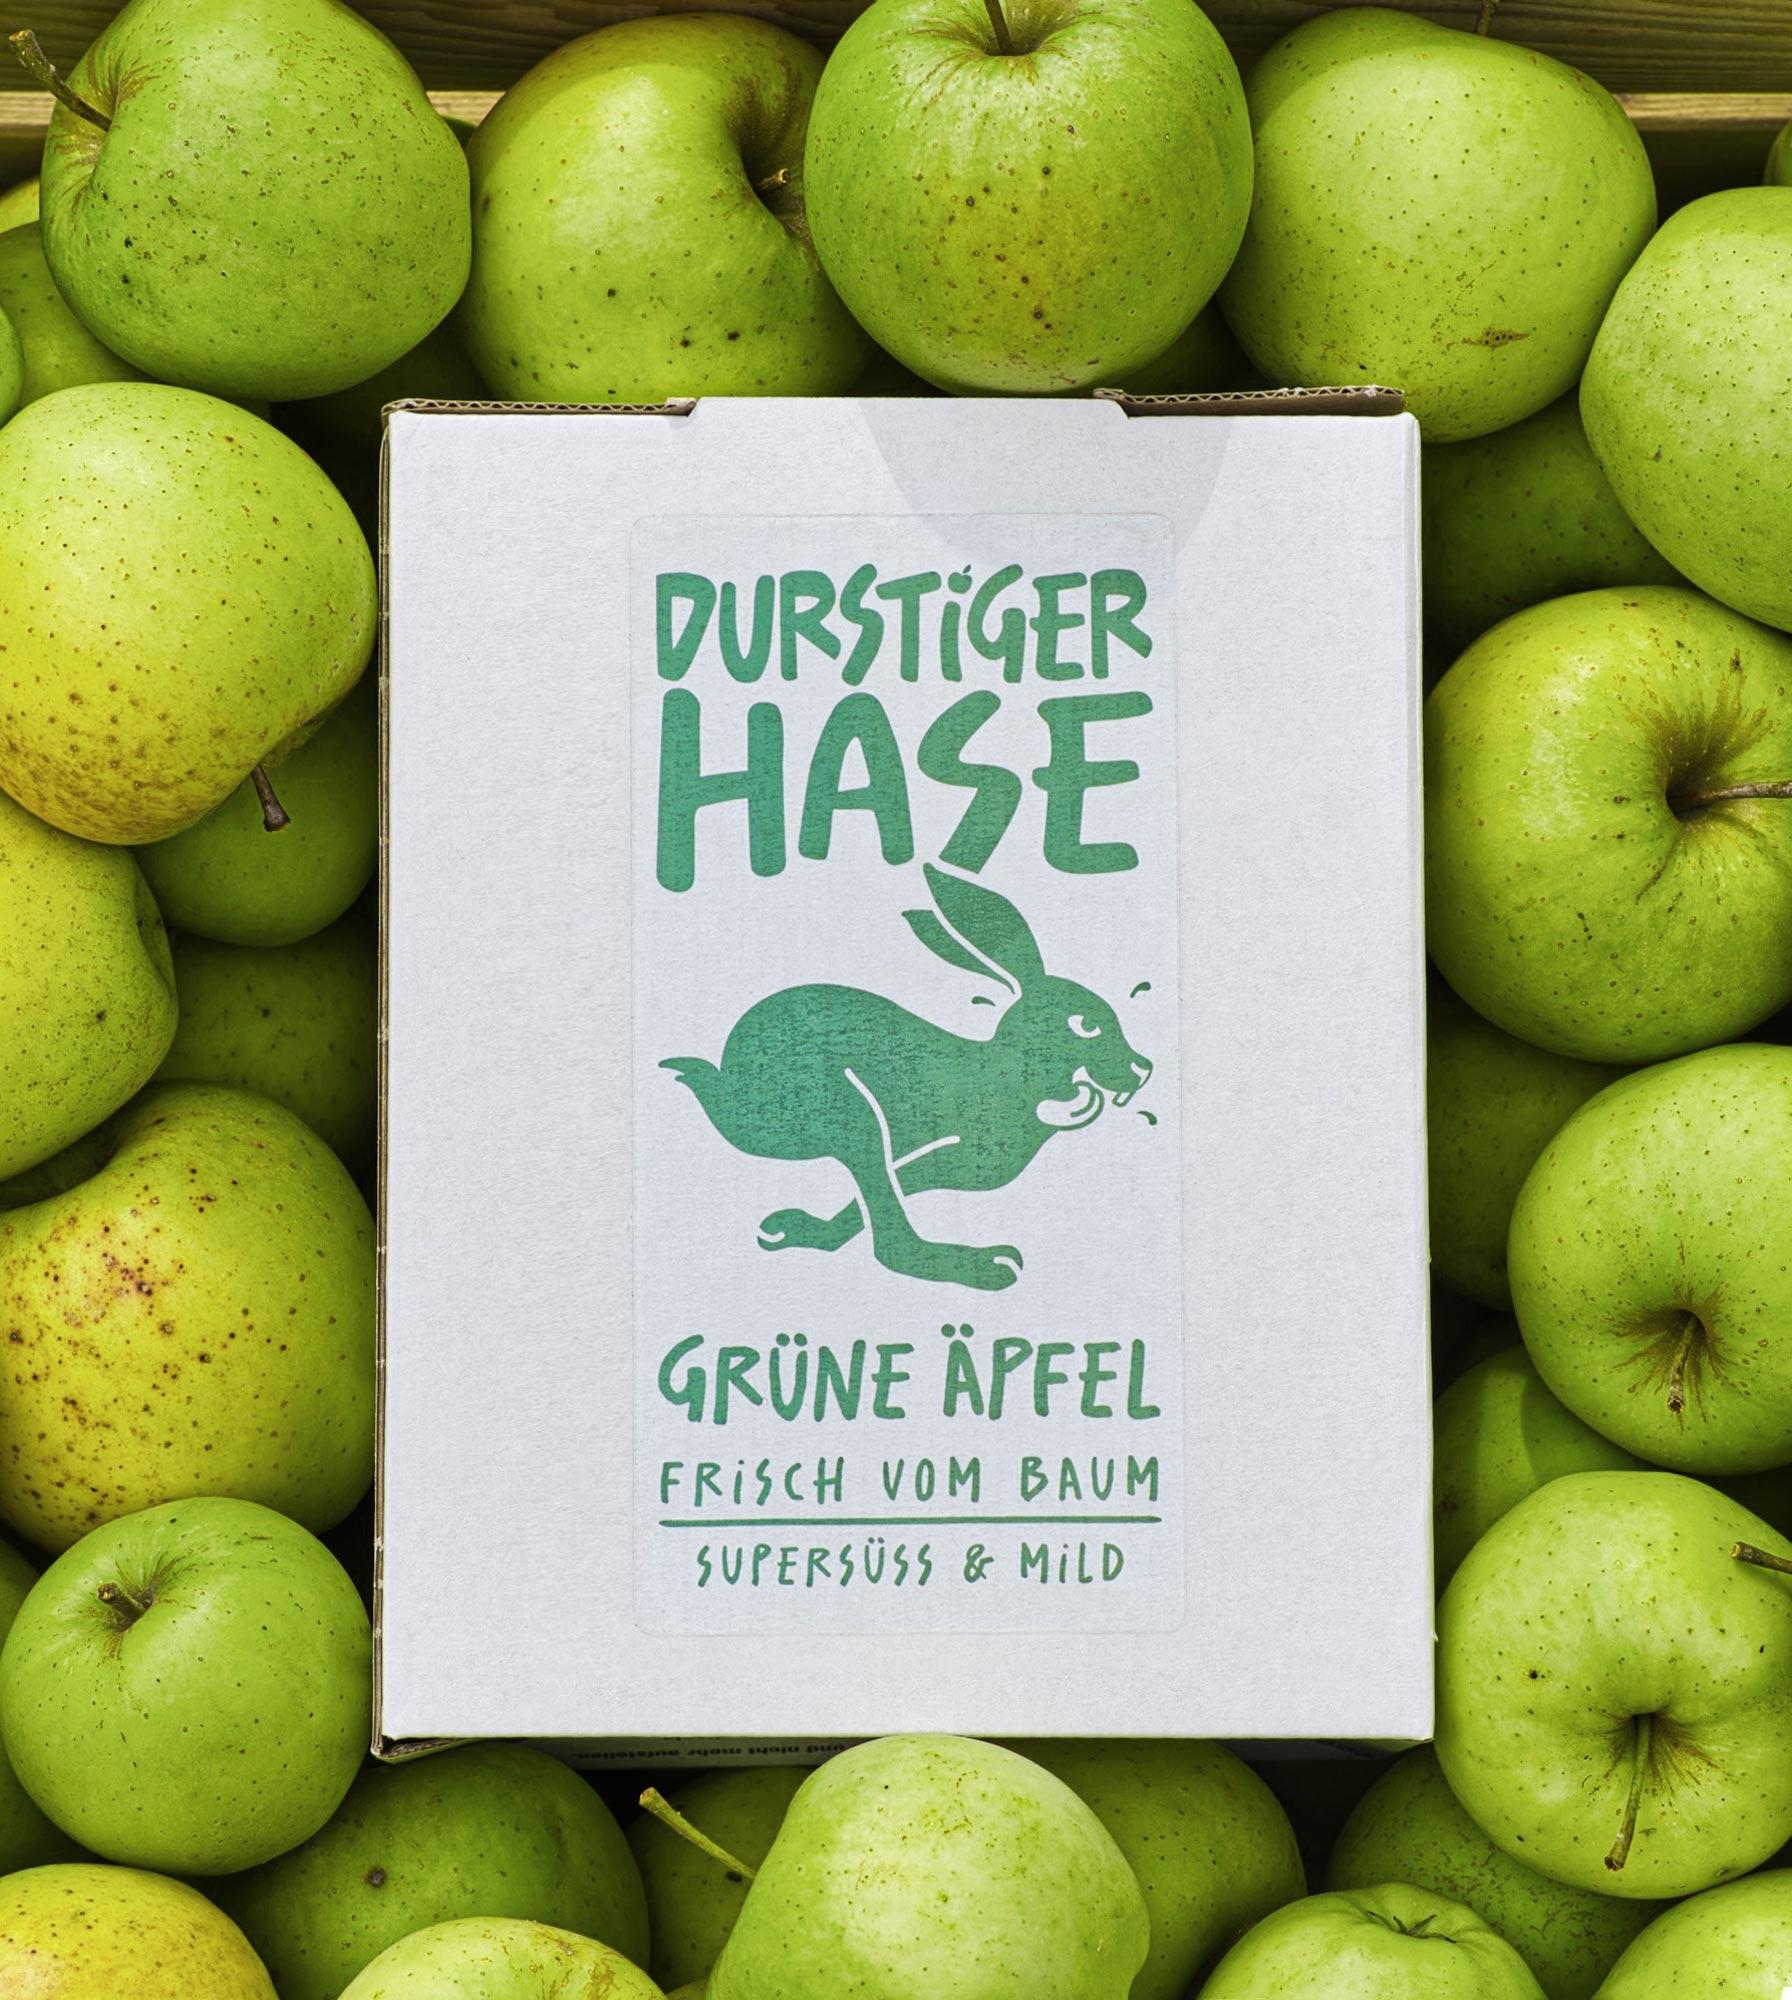 Durstiger-Hase-gruene-aepfel-GPU-Design